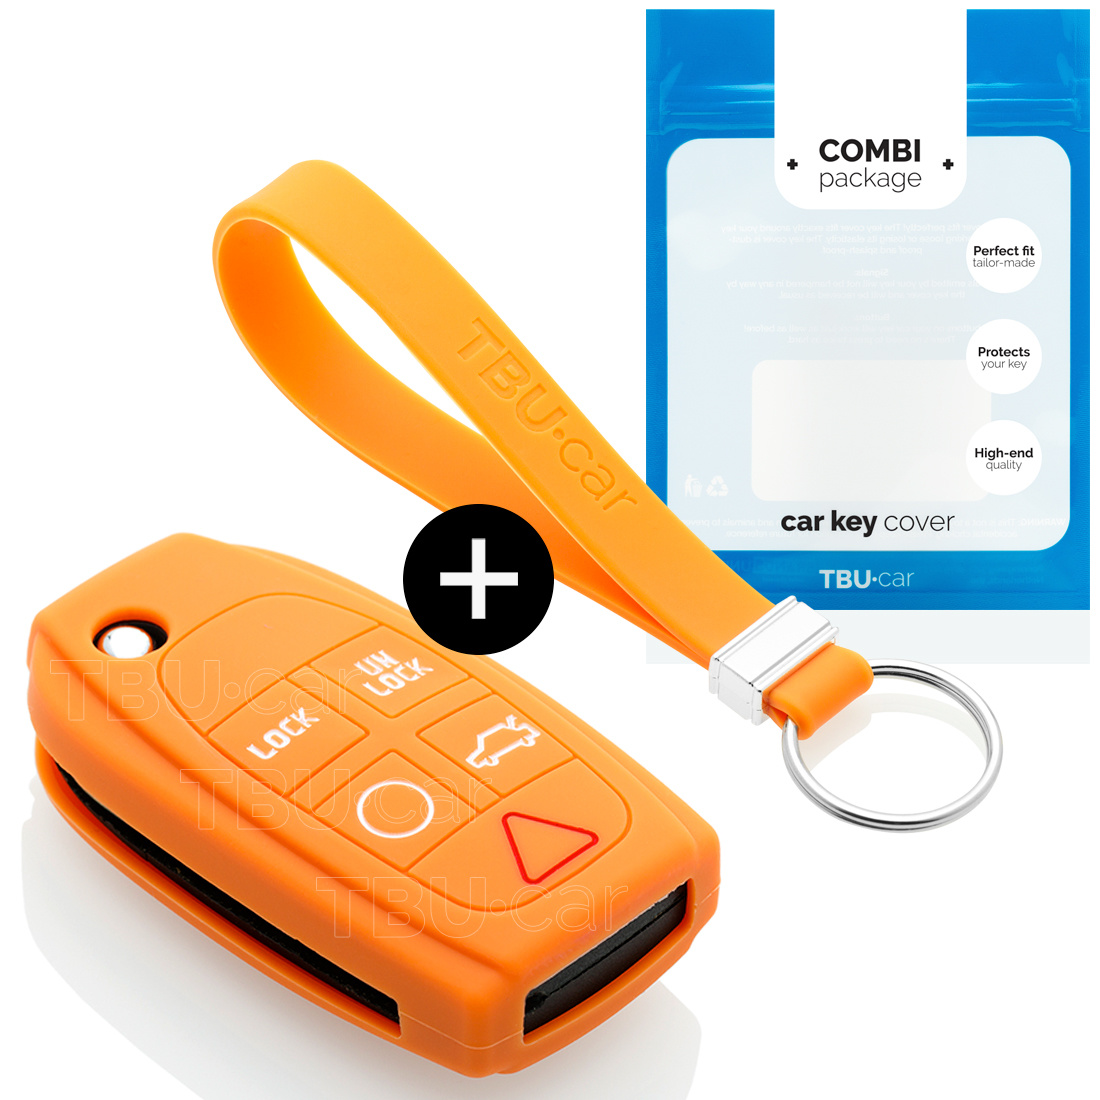 TBU car TBU car Autoschlüssel Hülle kompatibel mit Volvo 5 Tasten - Schutzhülle aus Silikon - Auto Schlüsselhülle Cover in Orange